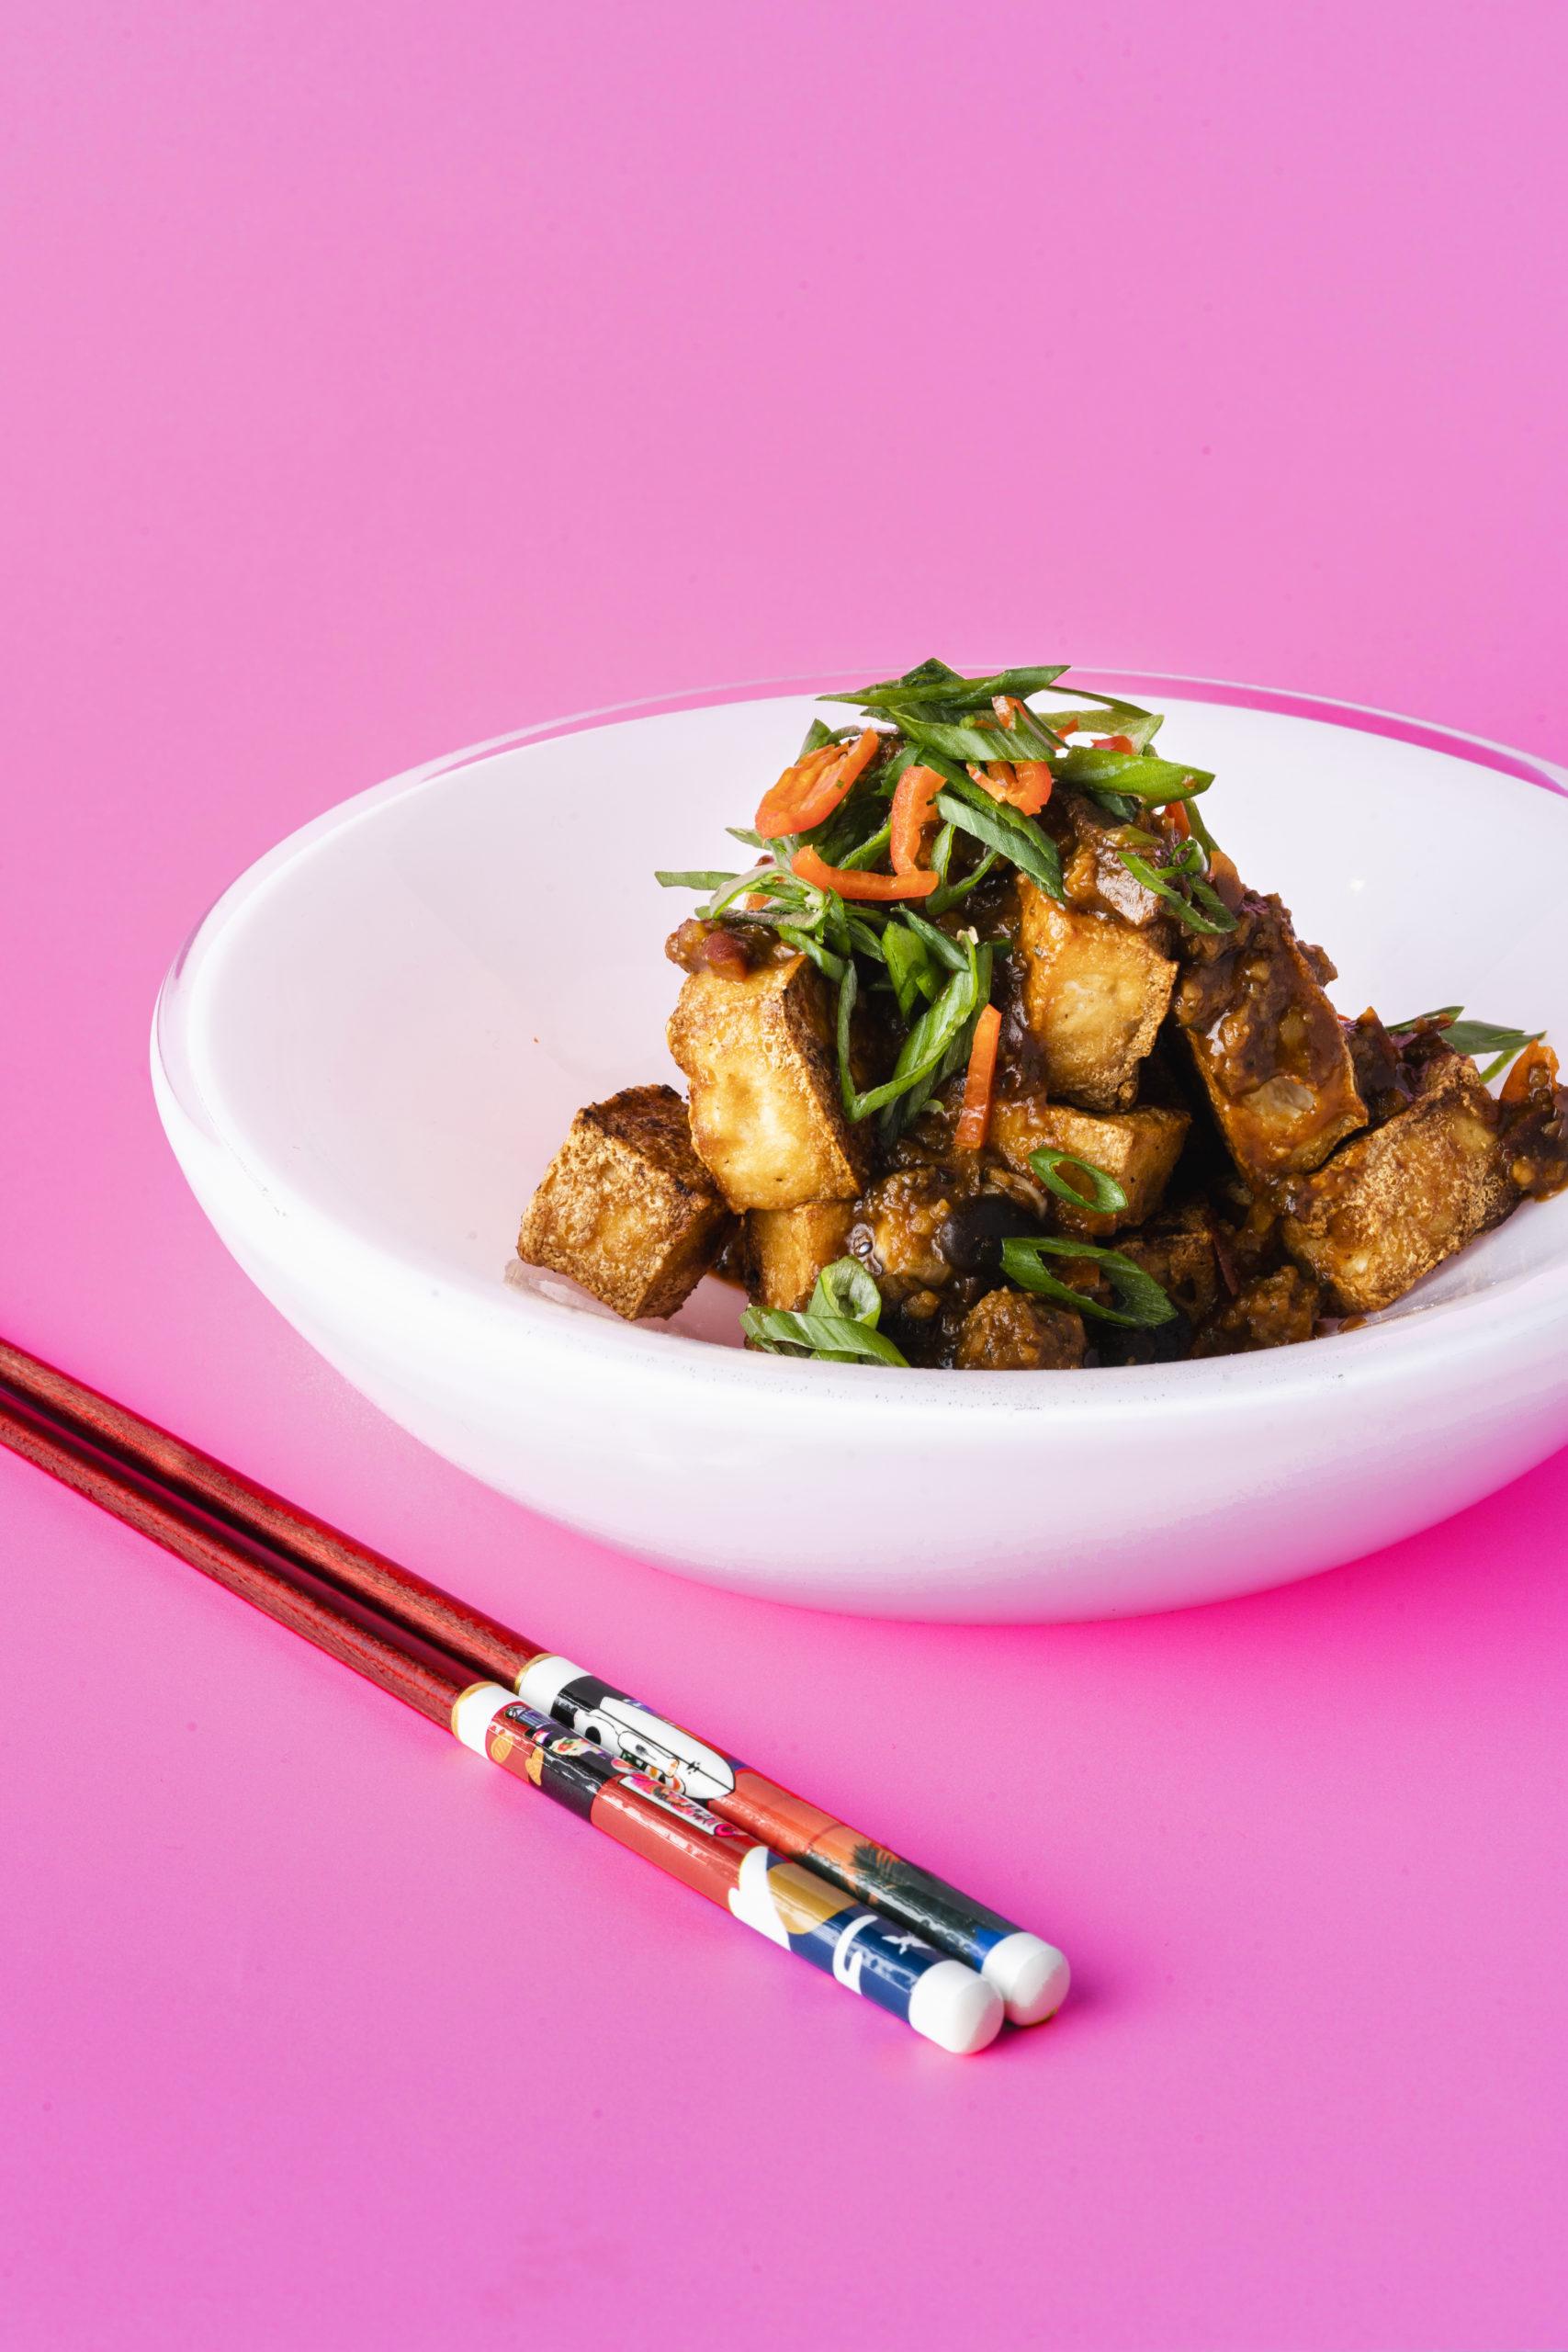 Mapo Tofu Bites